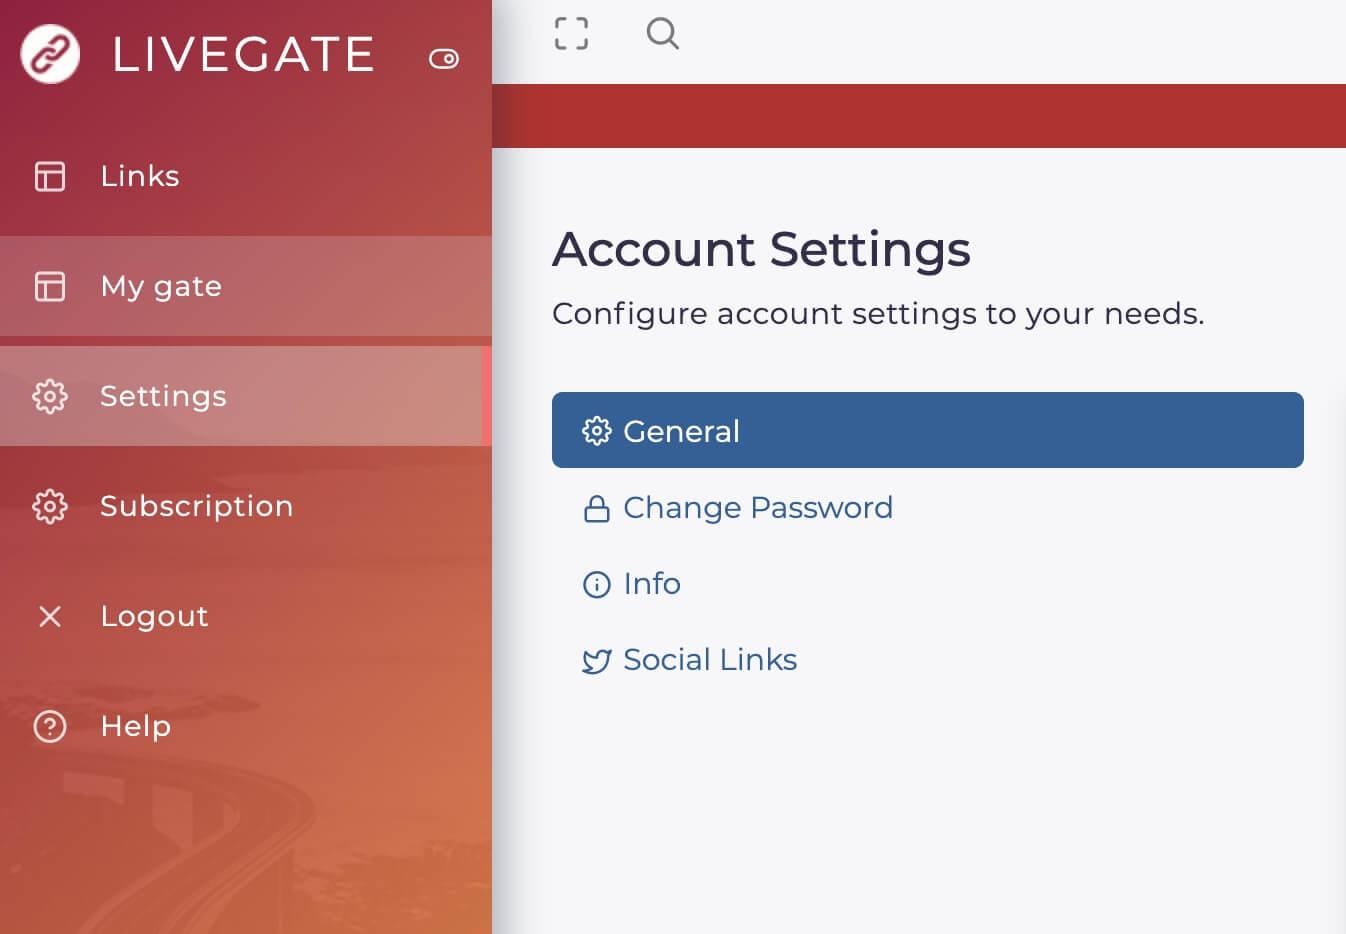 Livegate settings